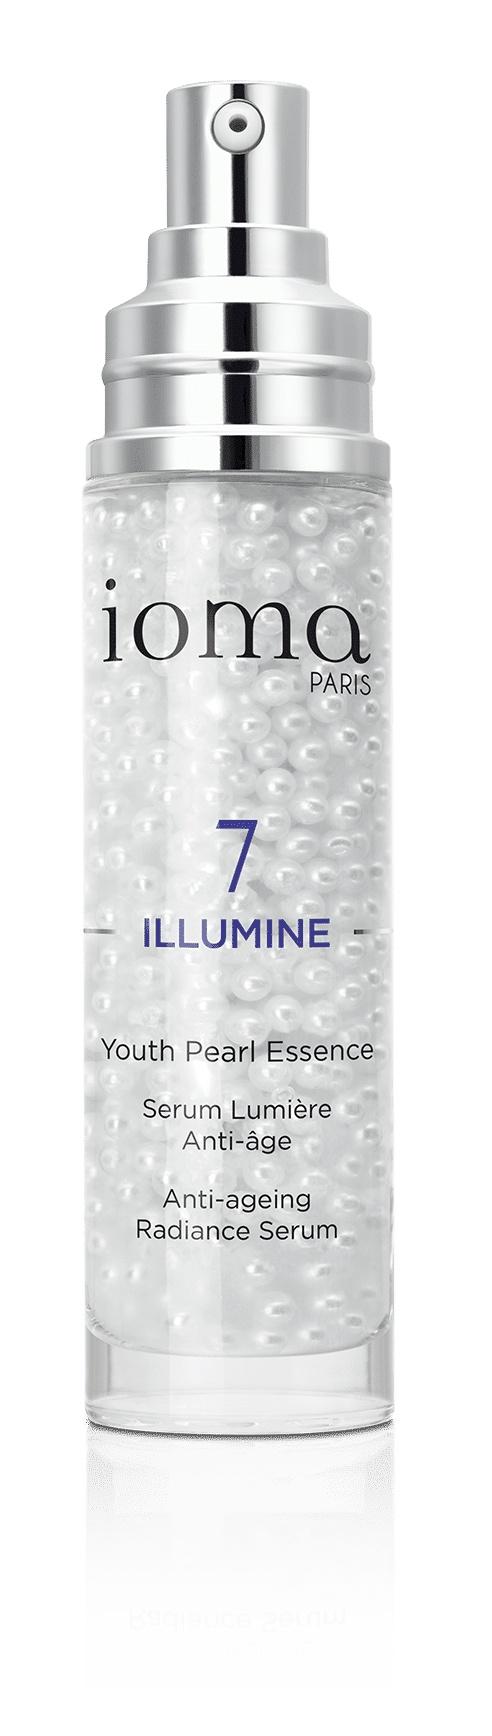 IOMA 7 Illumine Youth Pearl Essence